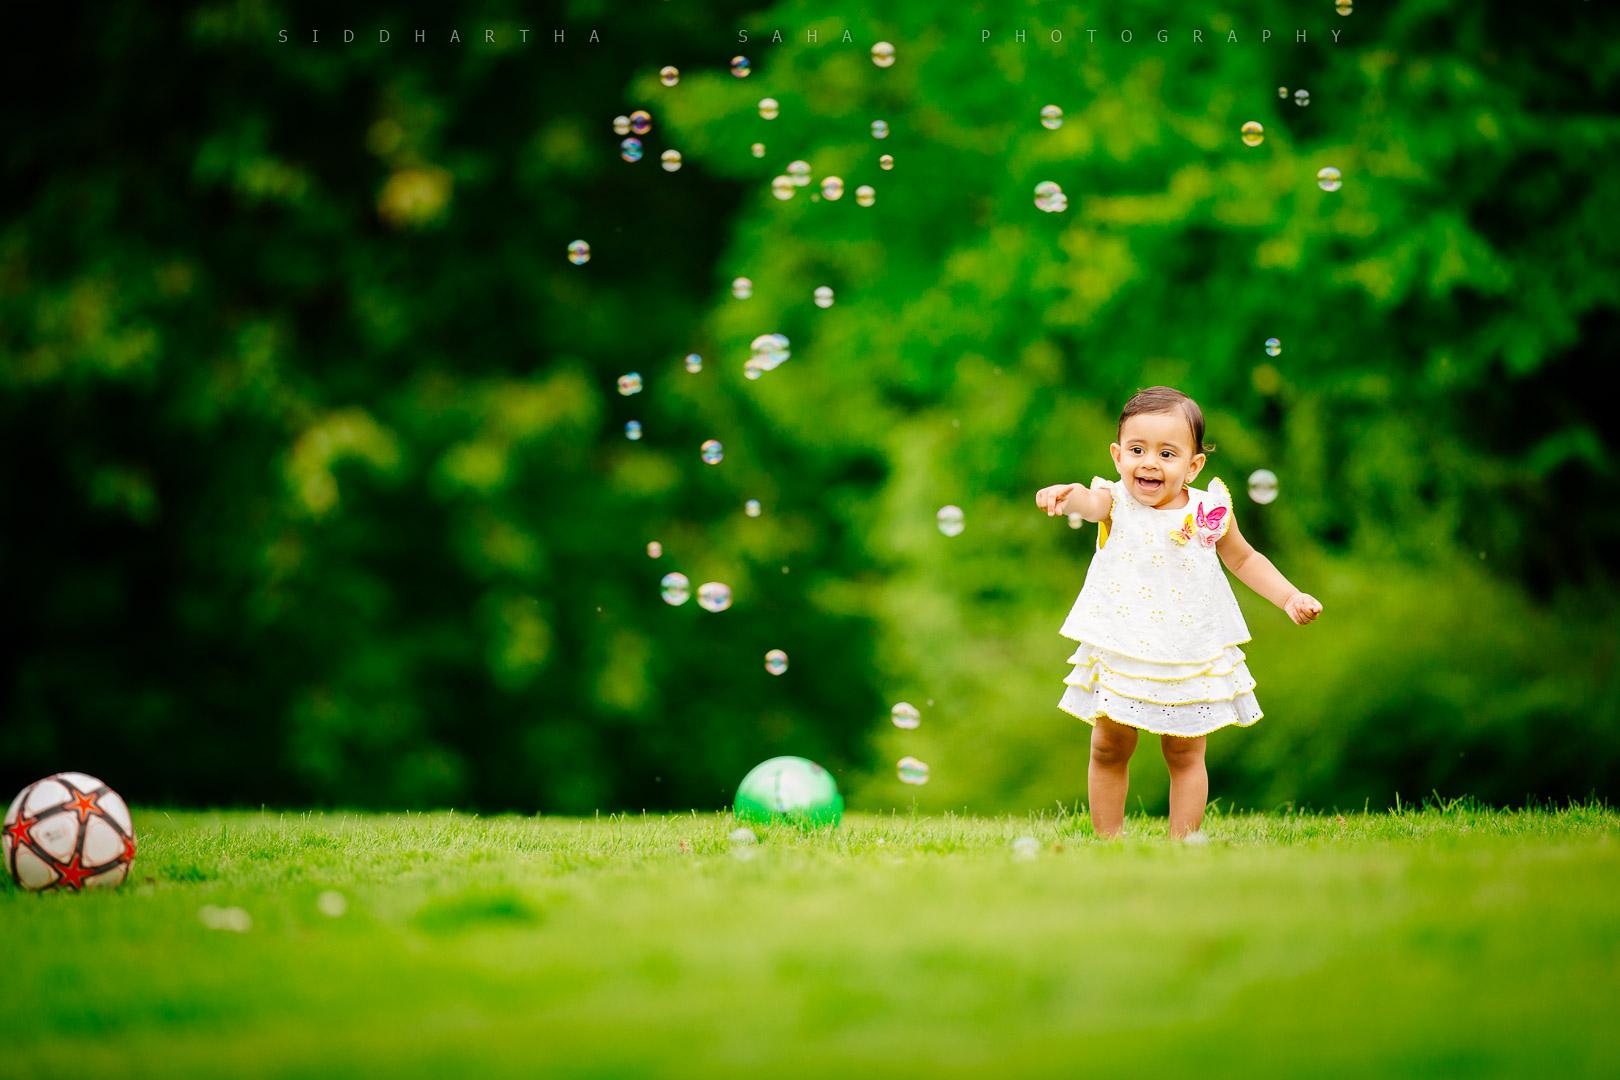 2015-08-08 - Padmaja Ketan Family Photoshoot - _05Y8193